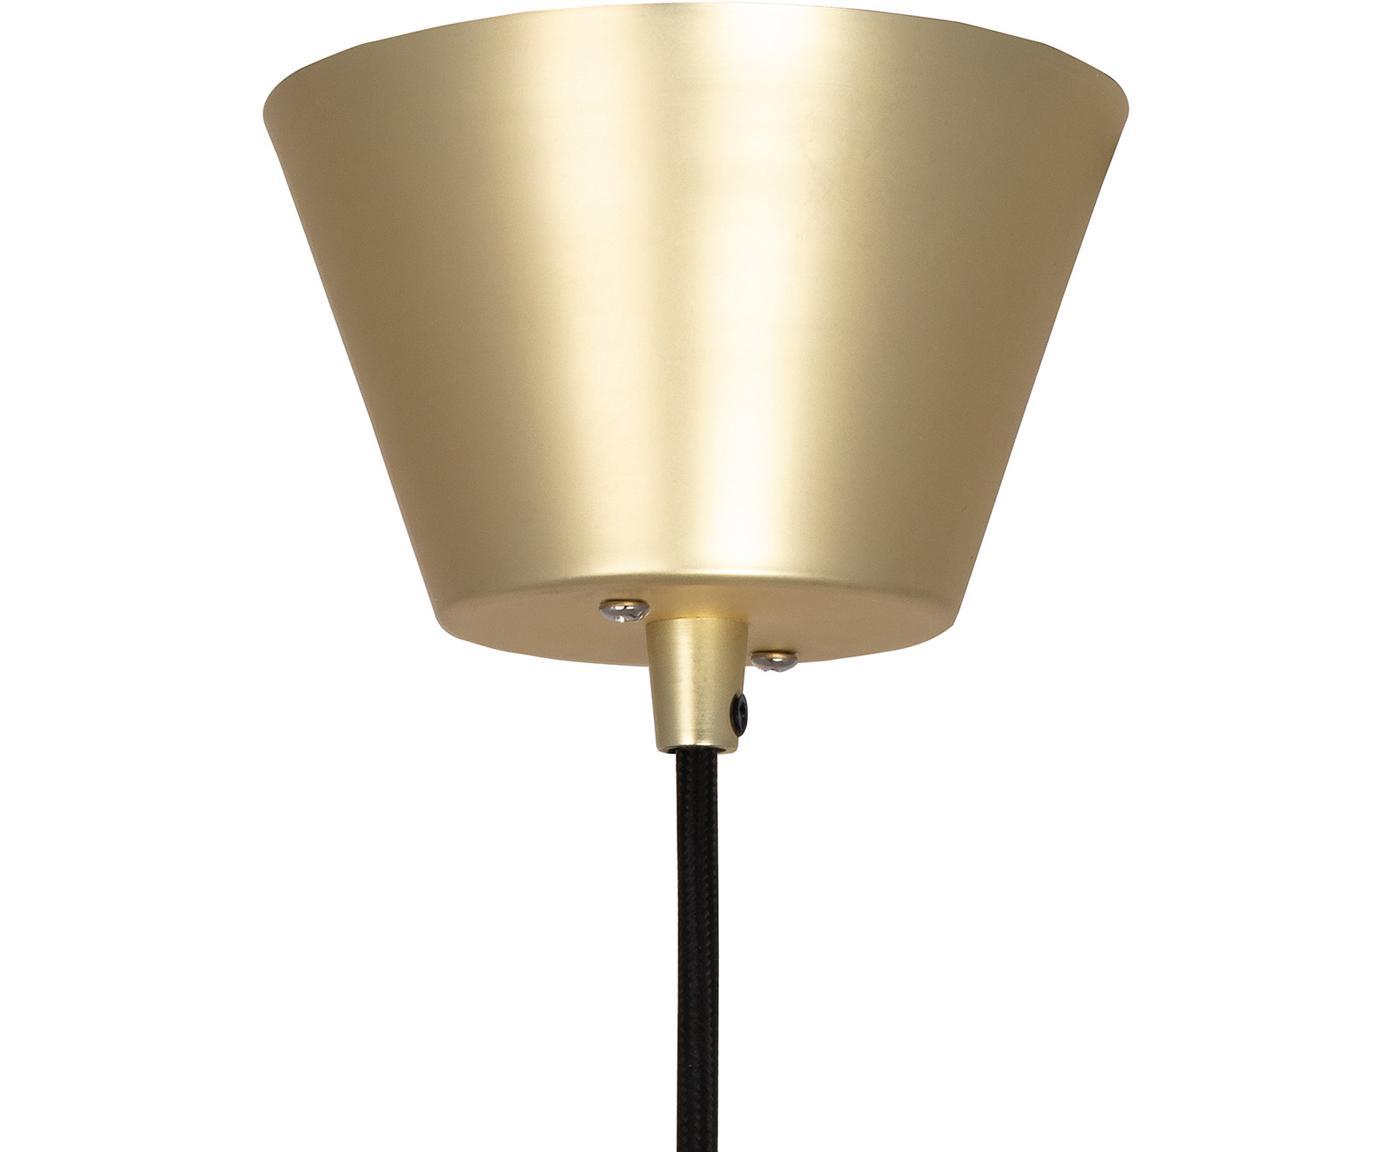 Hanglamp Ray, Lampenkap: vermessingd en geborsteld, Baldakijn: gelakt metaal, Geborsteld messingkleurig, Ø 45 x H 25 cm